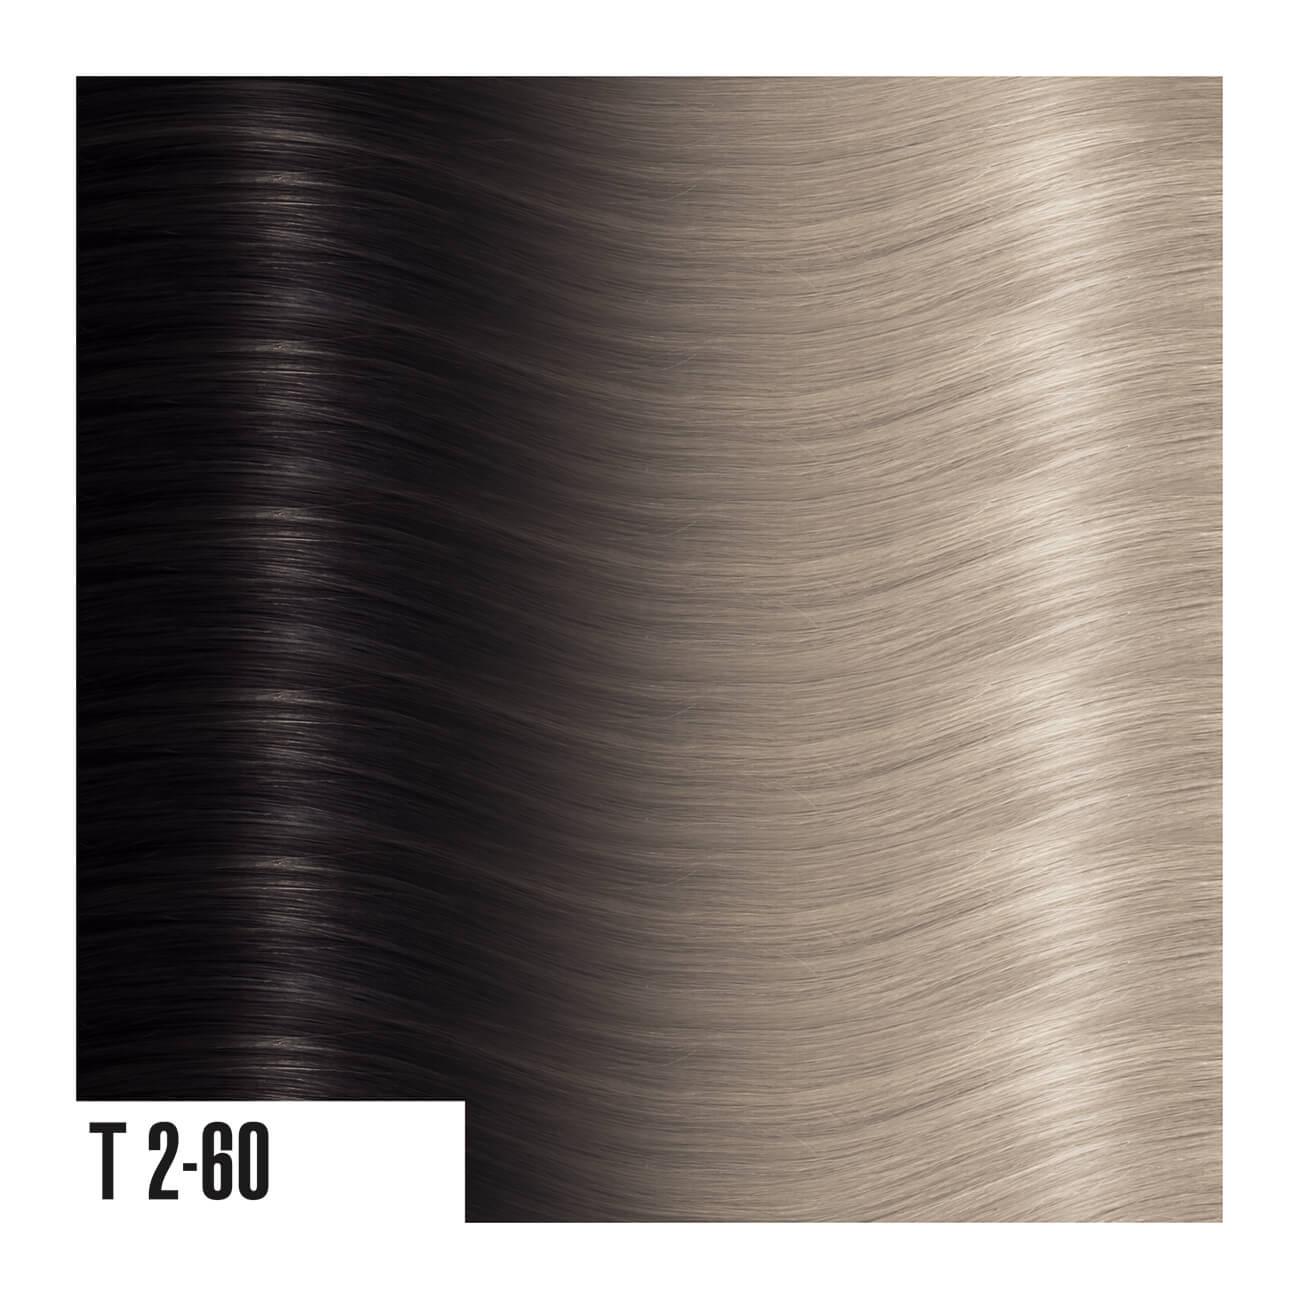 T2-60